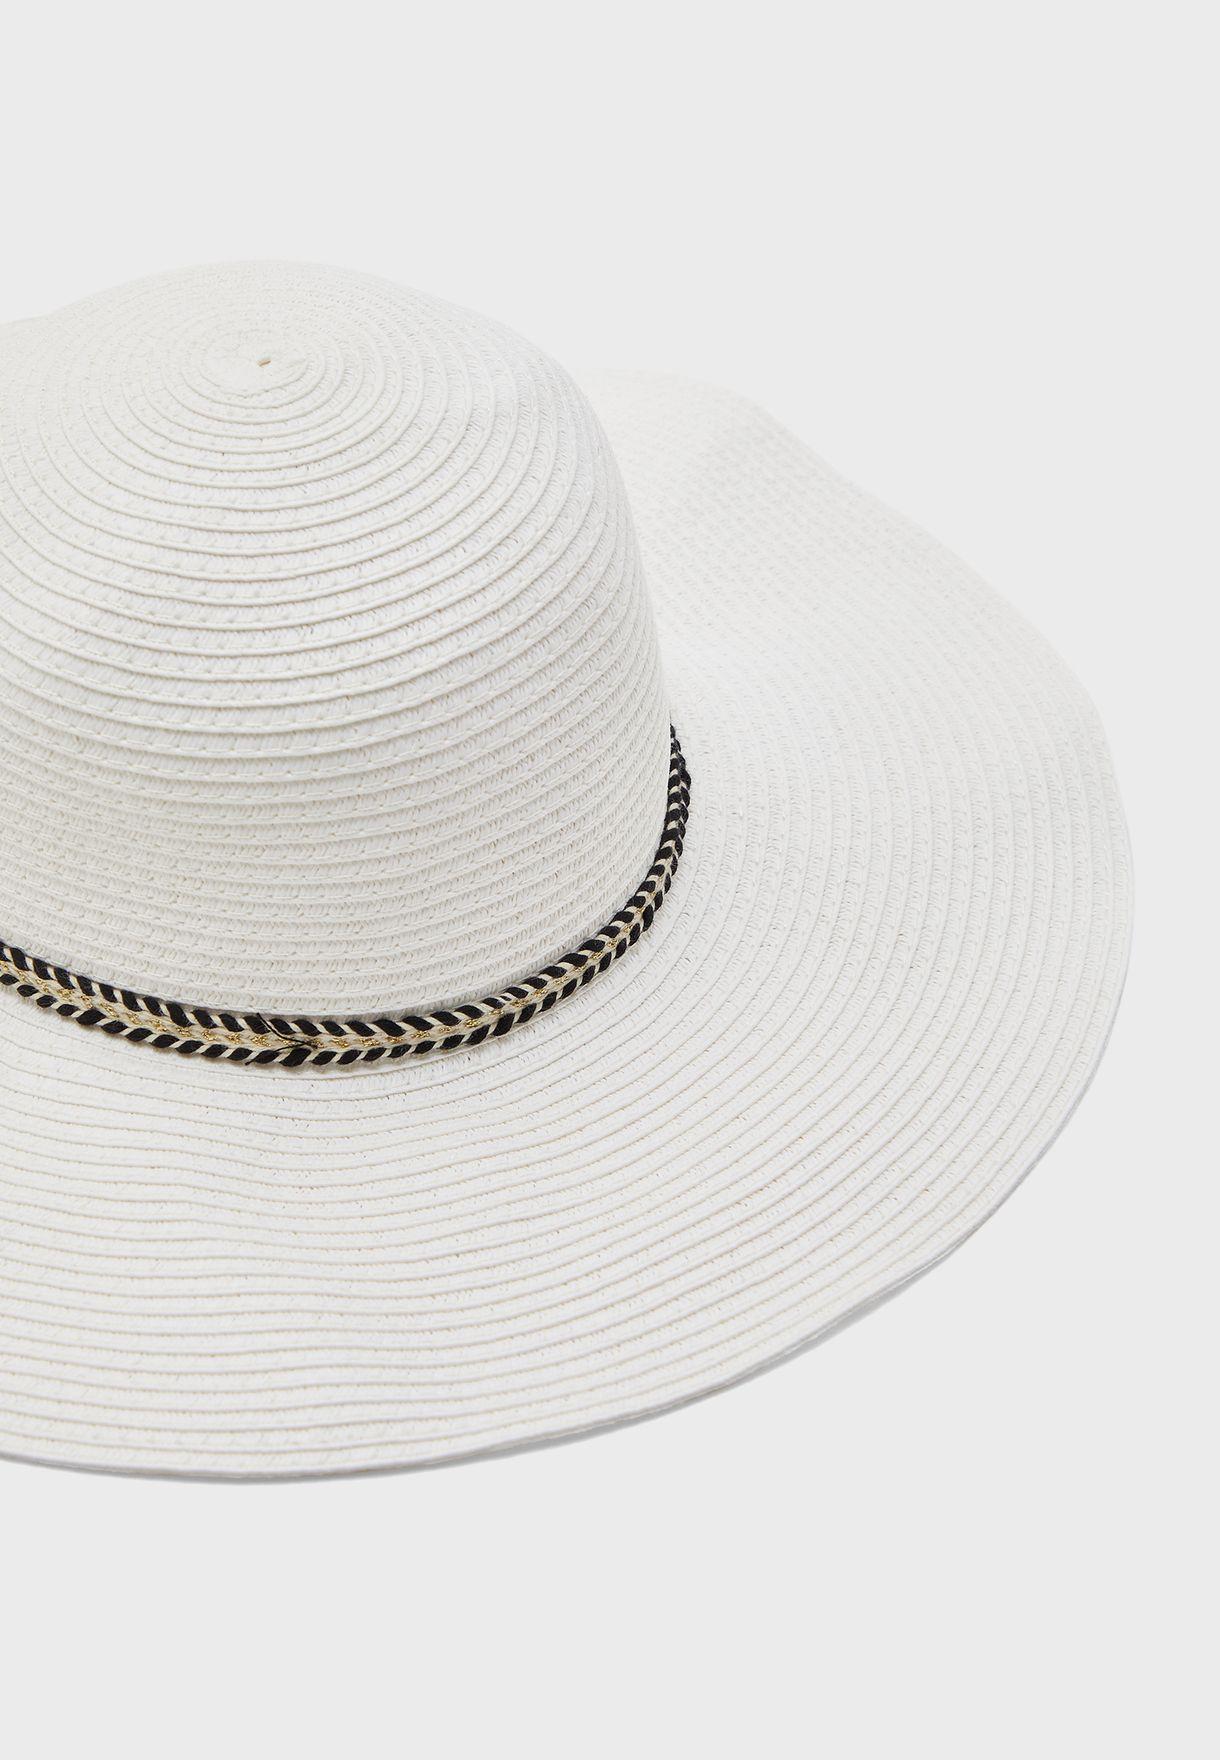 Ribbon Detail Floppy Hat